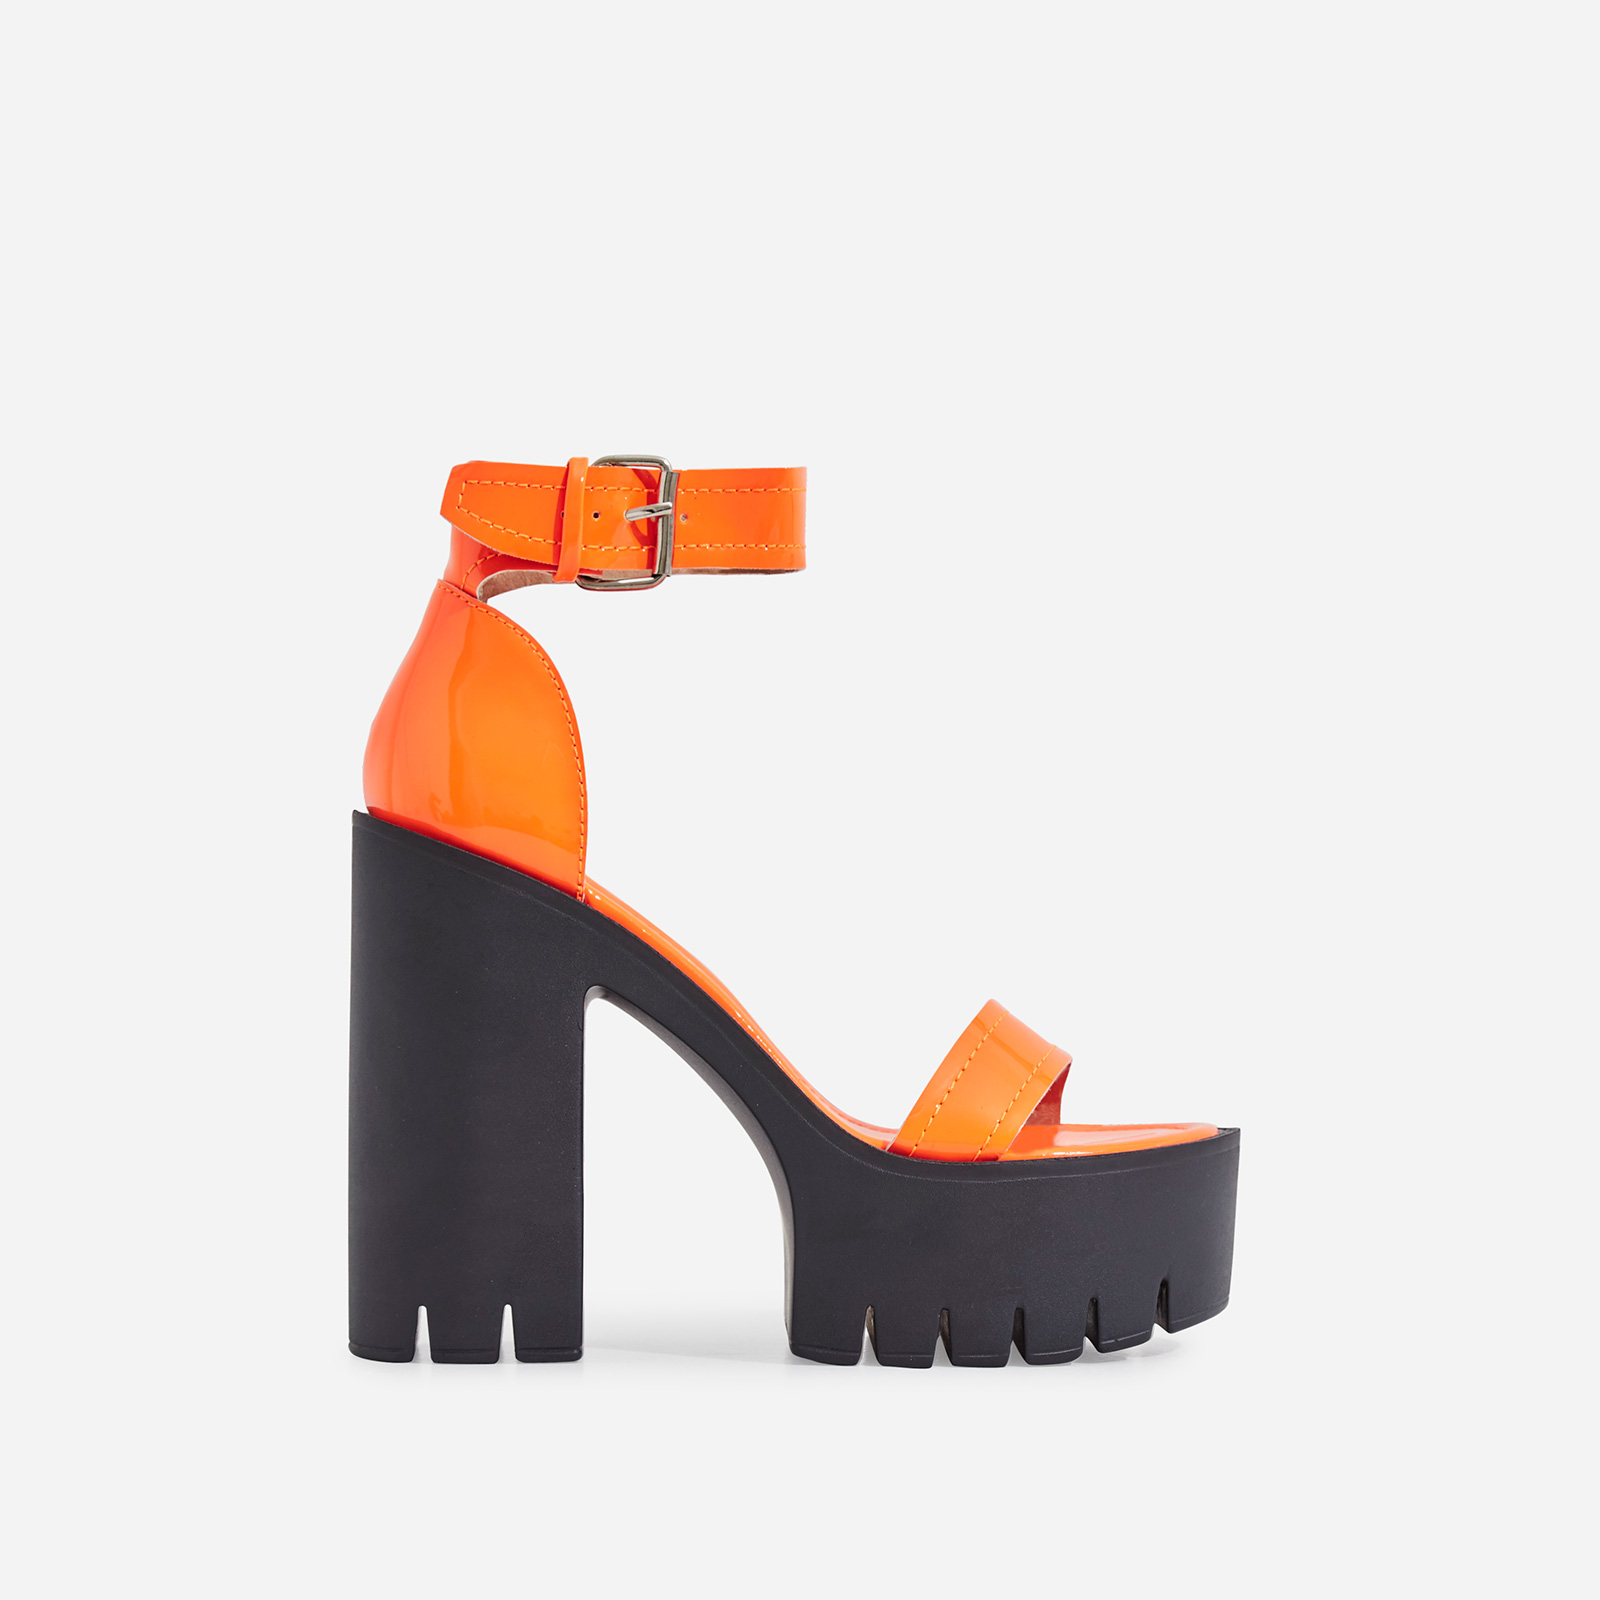 Stormi Platform Cleated Sole Block Heel In Orange Patent